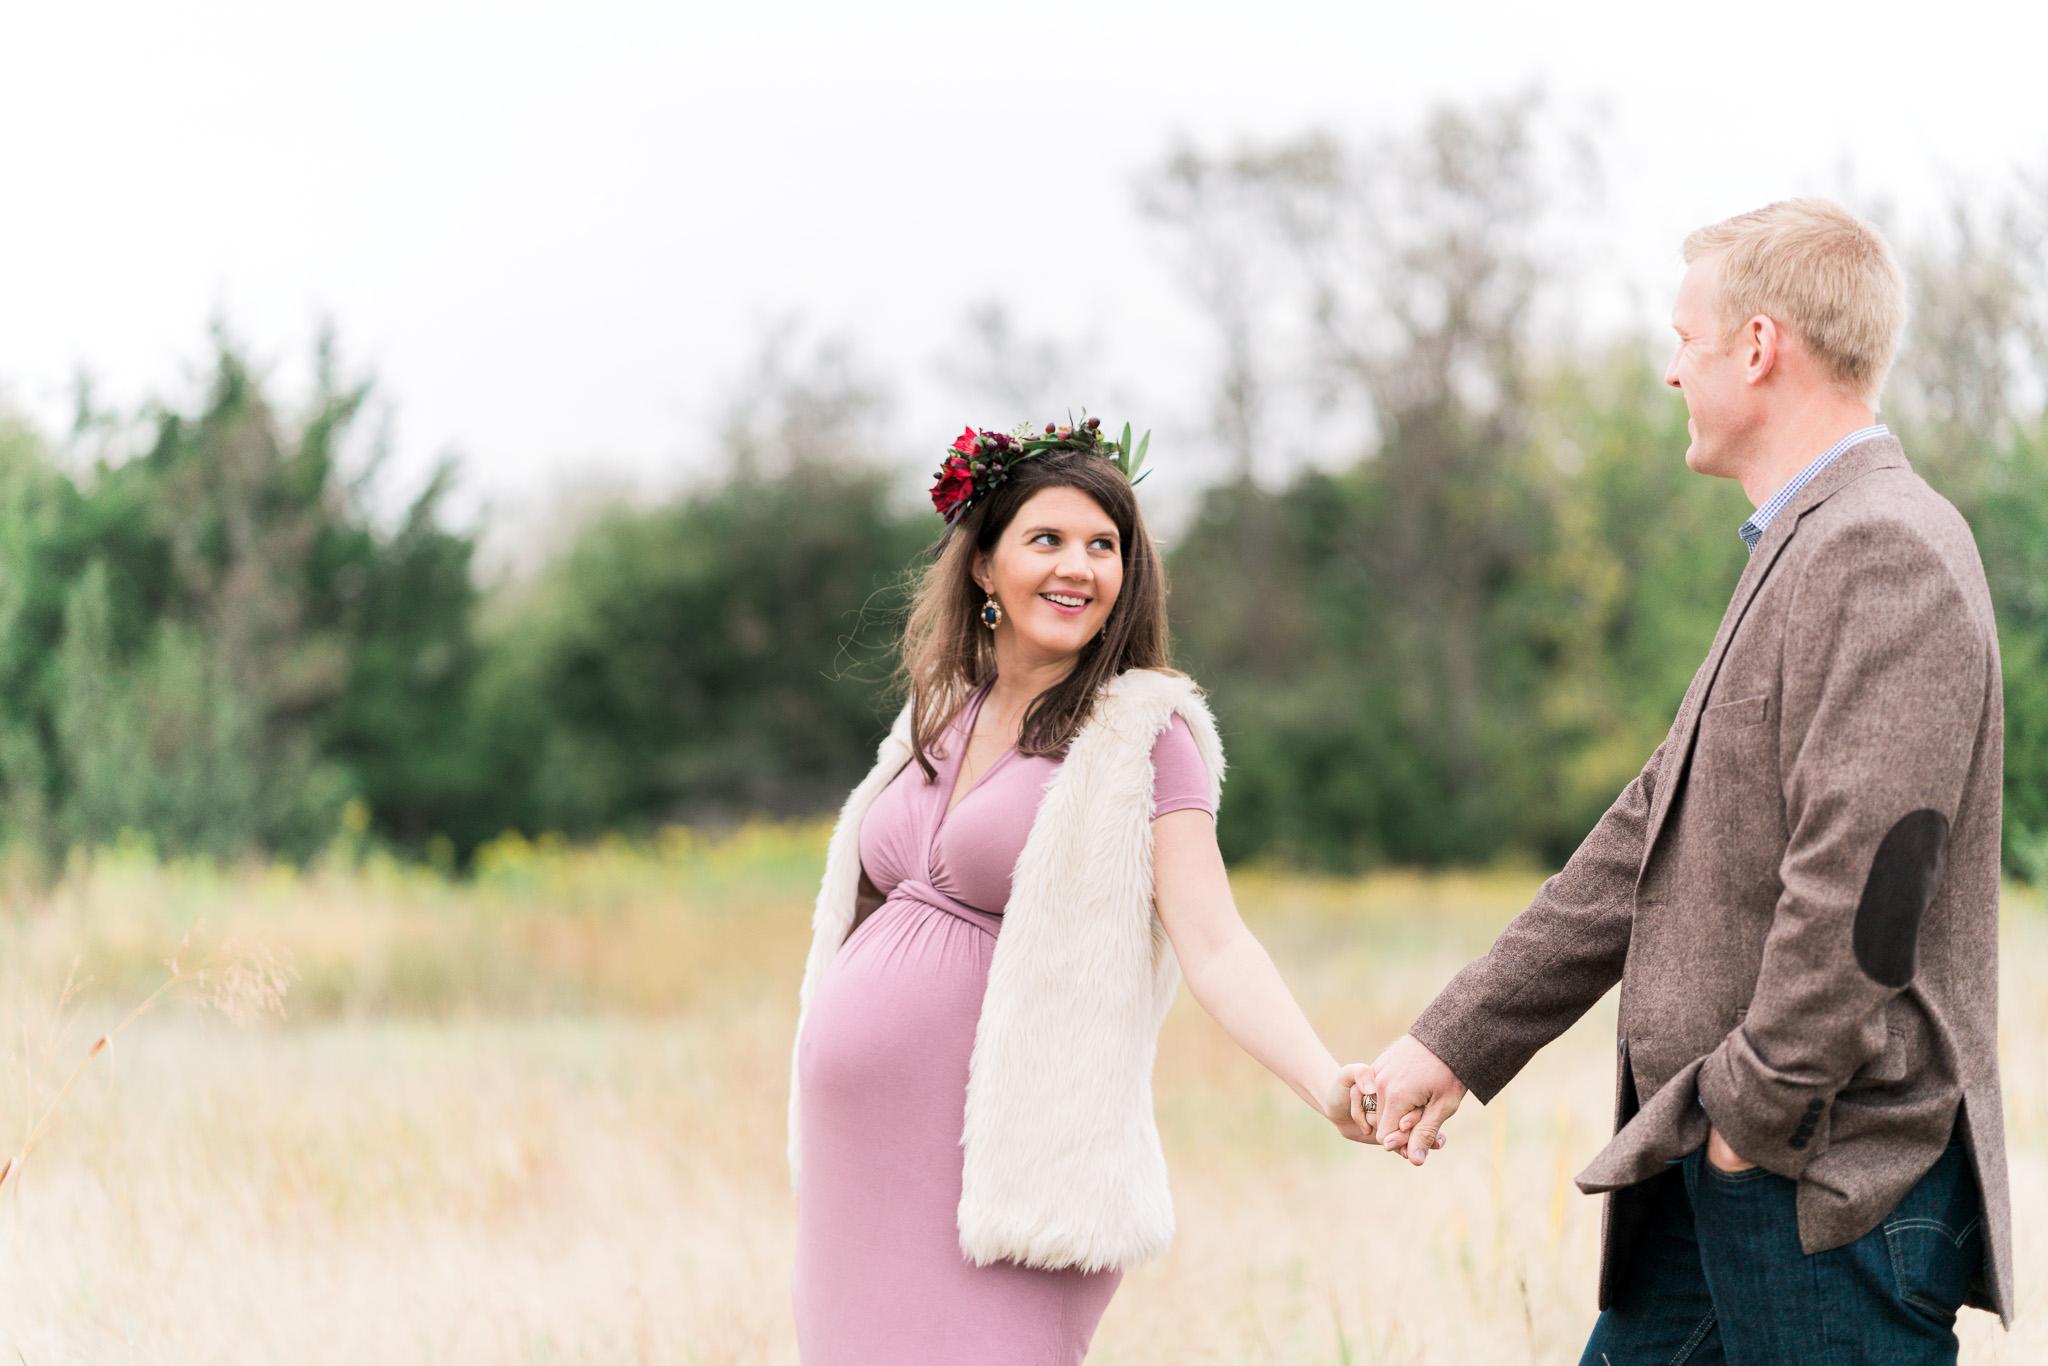 Lizanne-Andrew-Maternity-Kate-Bernard-Photography-Web-47.jpg